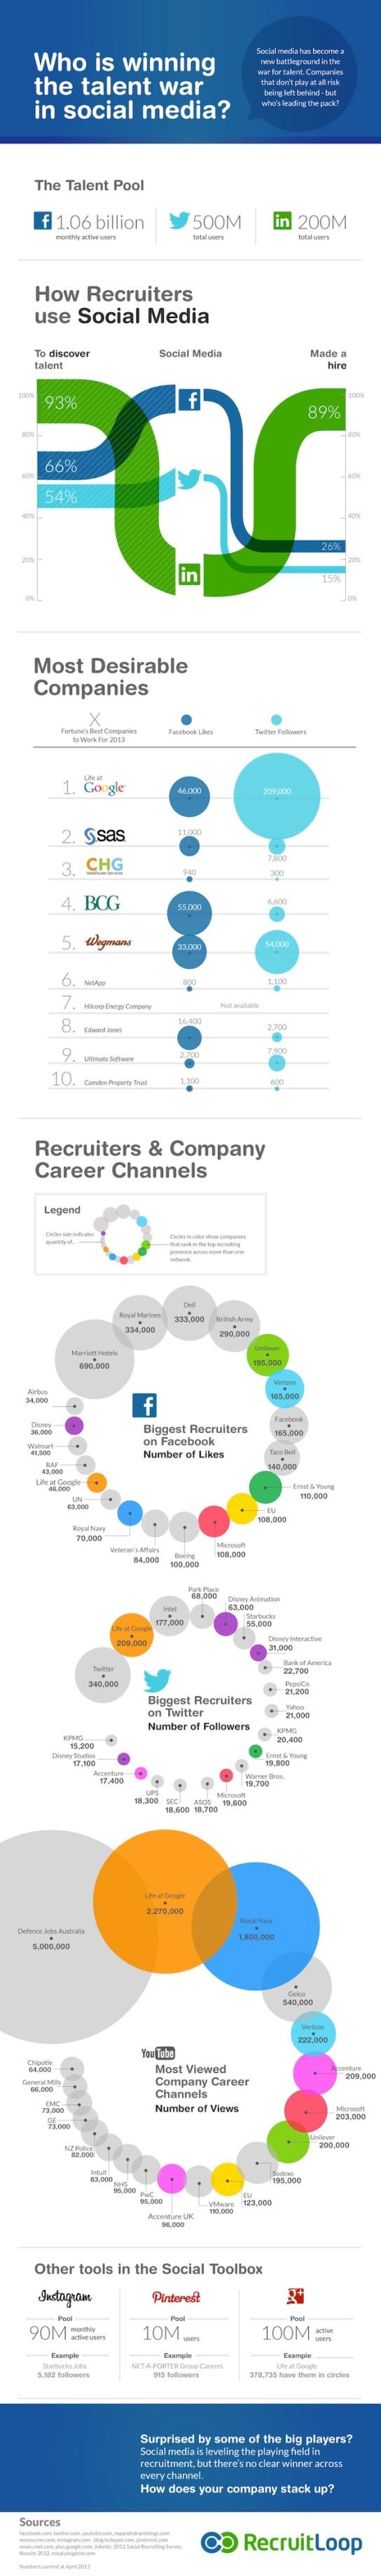 Whos-winning-the-talent-war-in-social-media-RecruitLoop